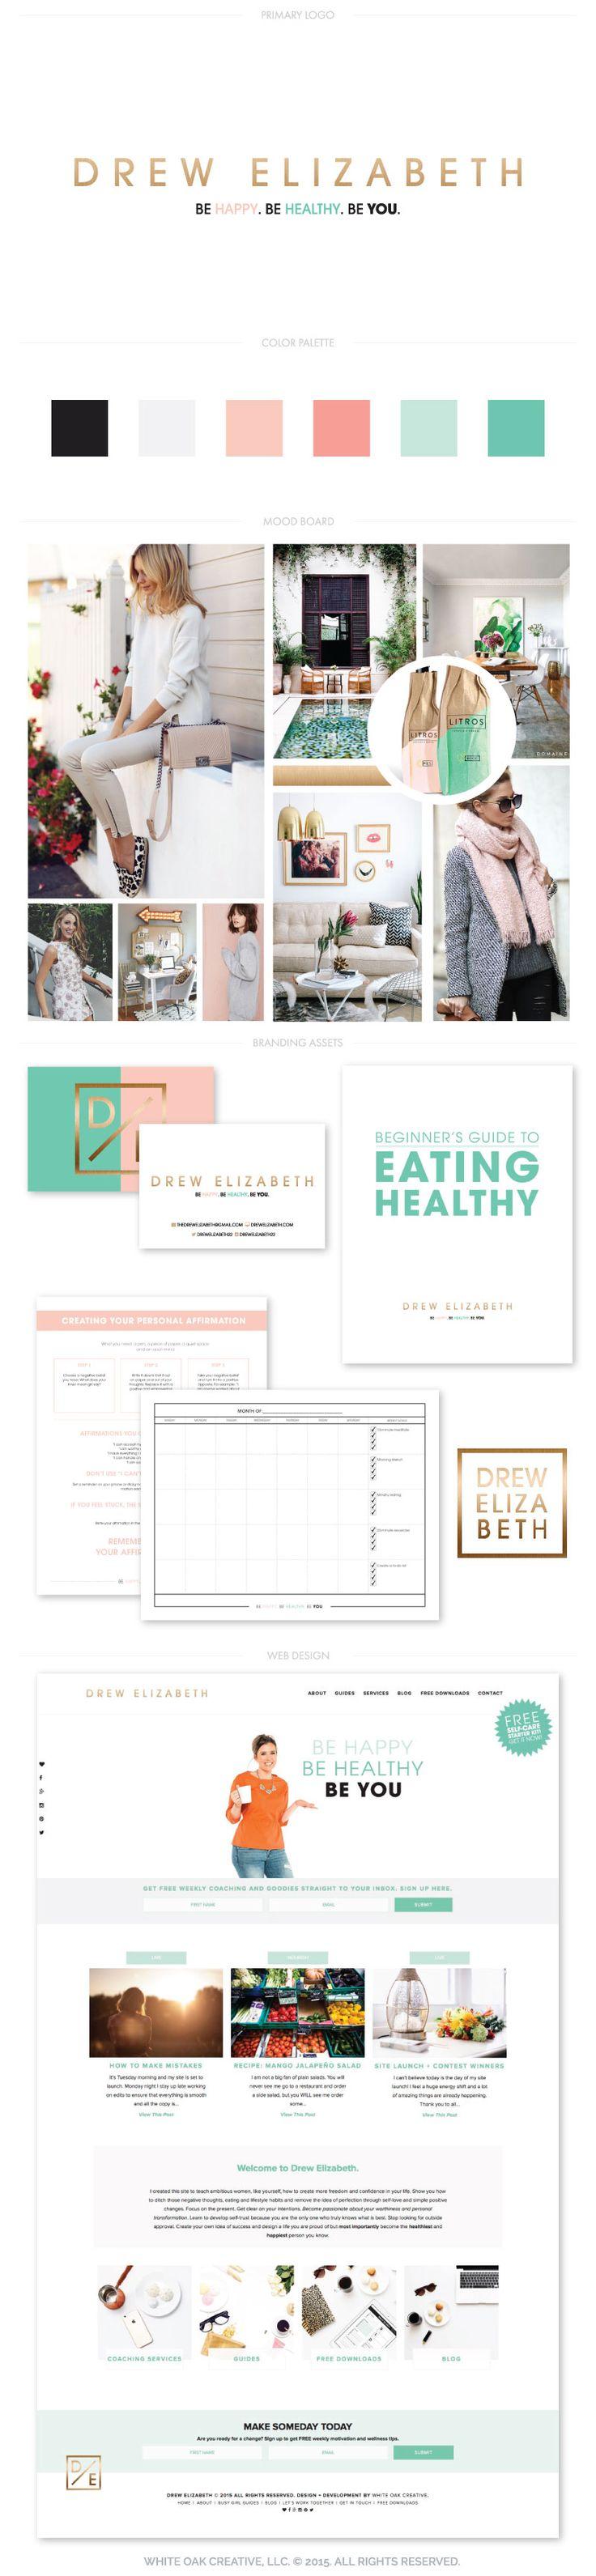 Branding + web design for Drew Elizabeth, logo design, branding, brand identity, brand strategy